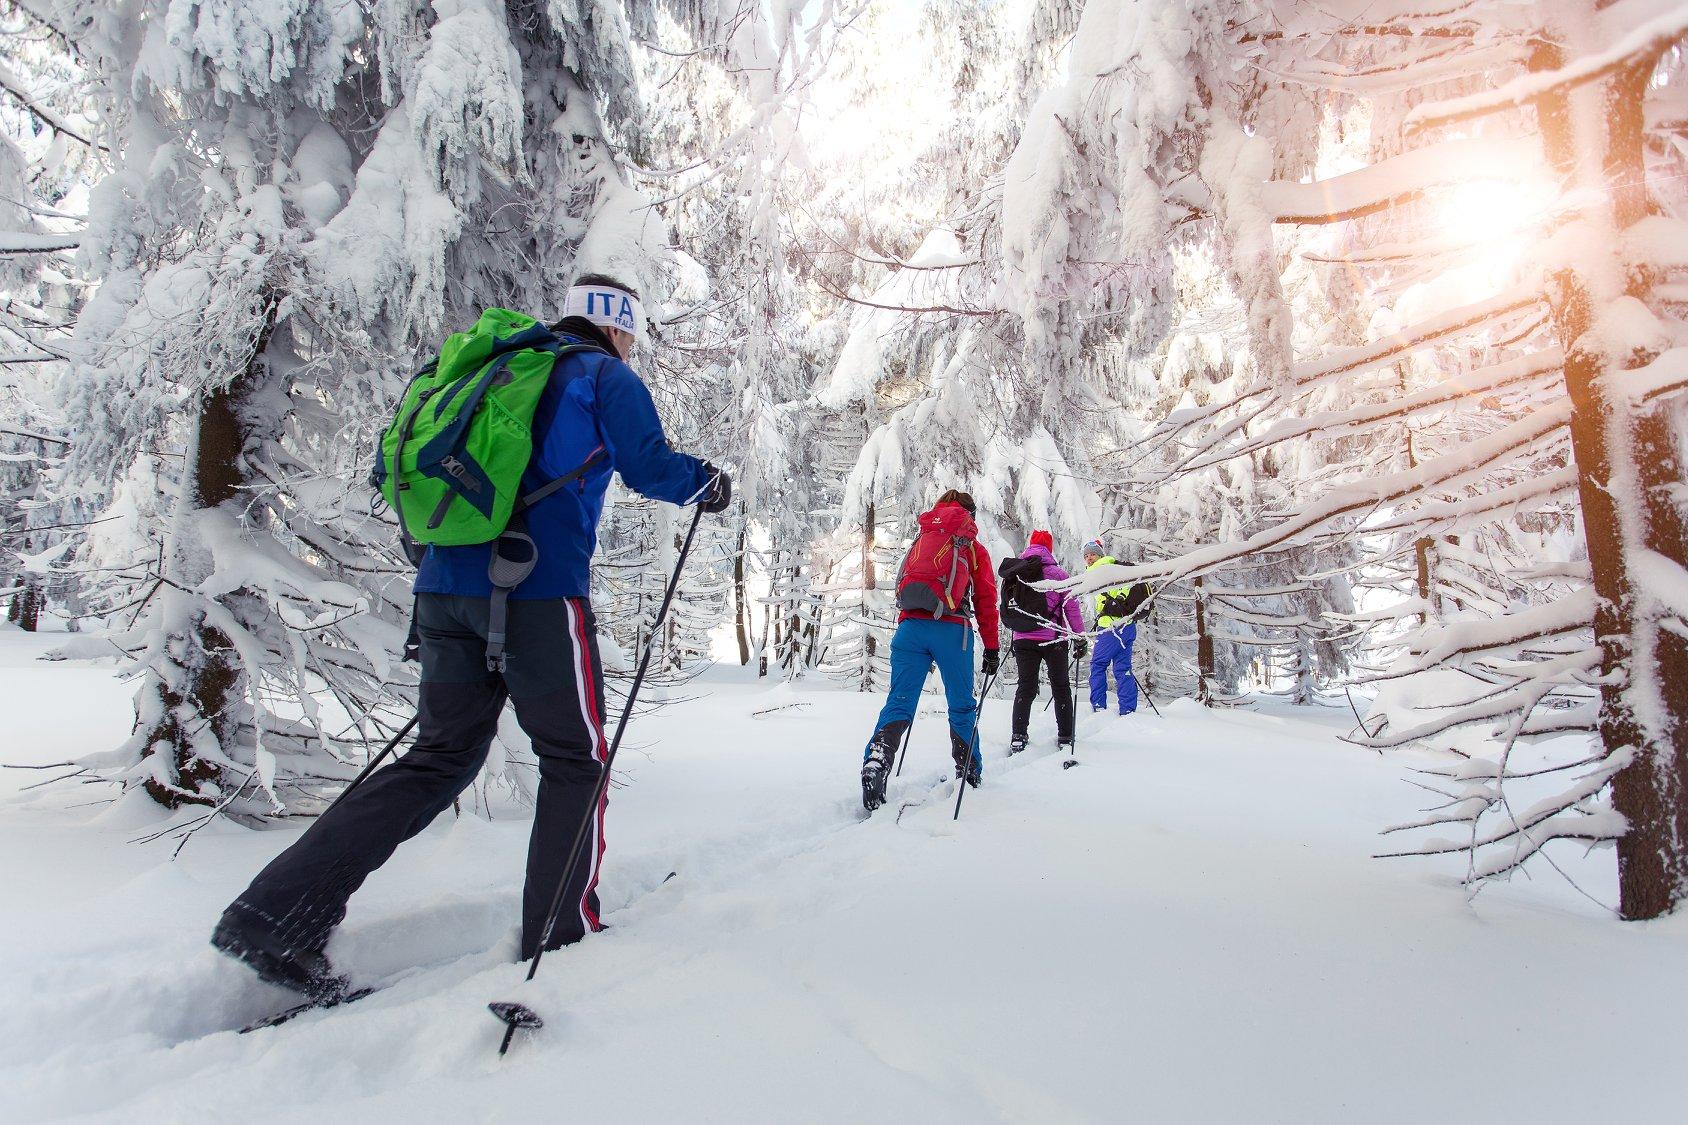 Stoneman Miriquidi Snow Schnee Langlauf Back COuntry Winter Abenteuer